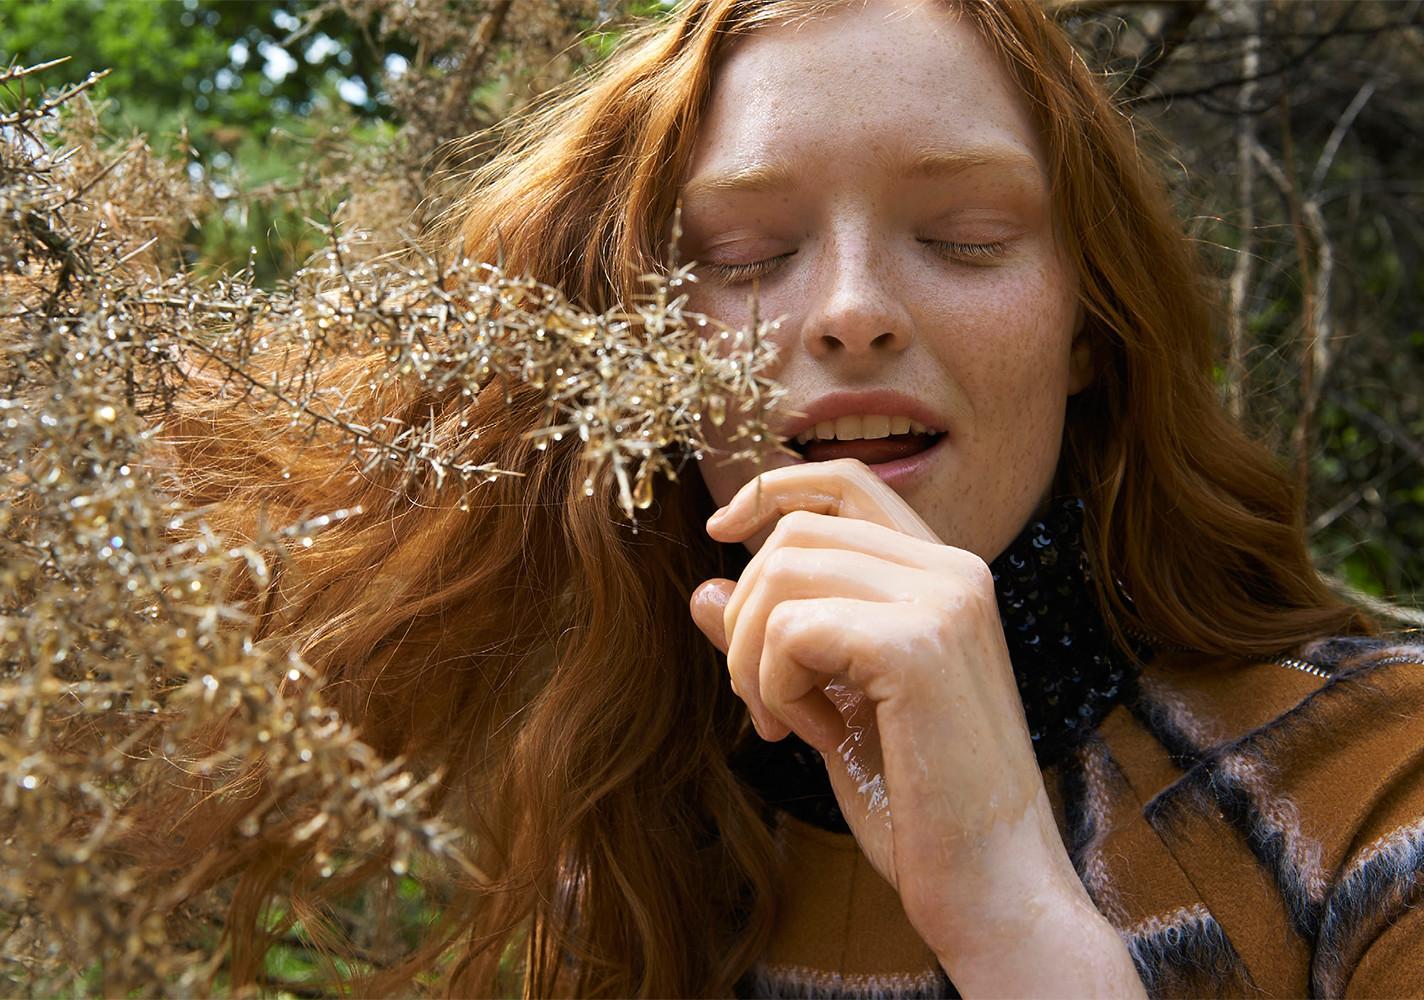 Harvest - © Amanda Camenisch